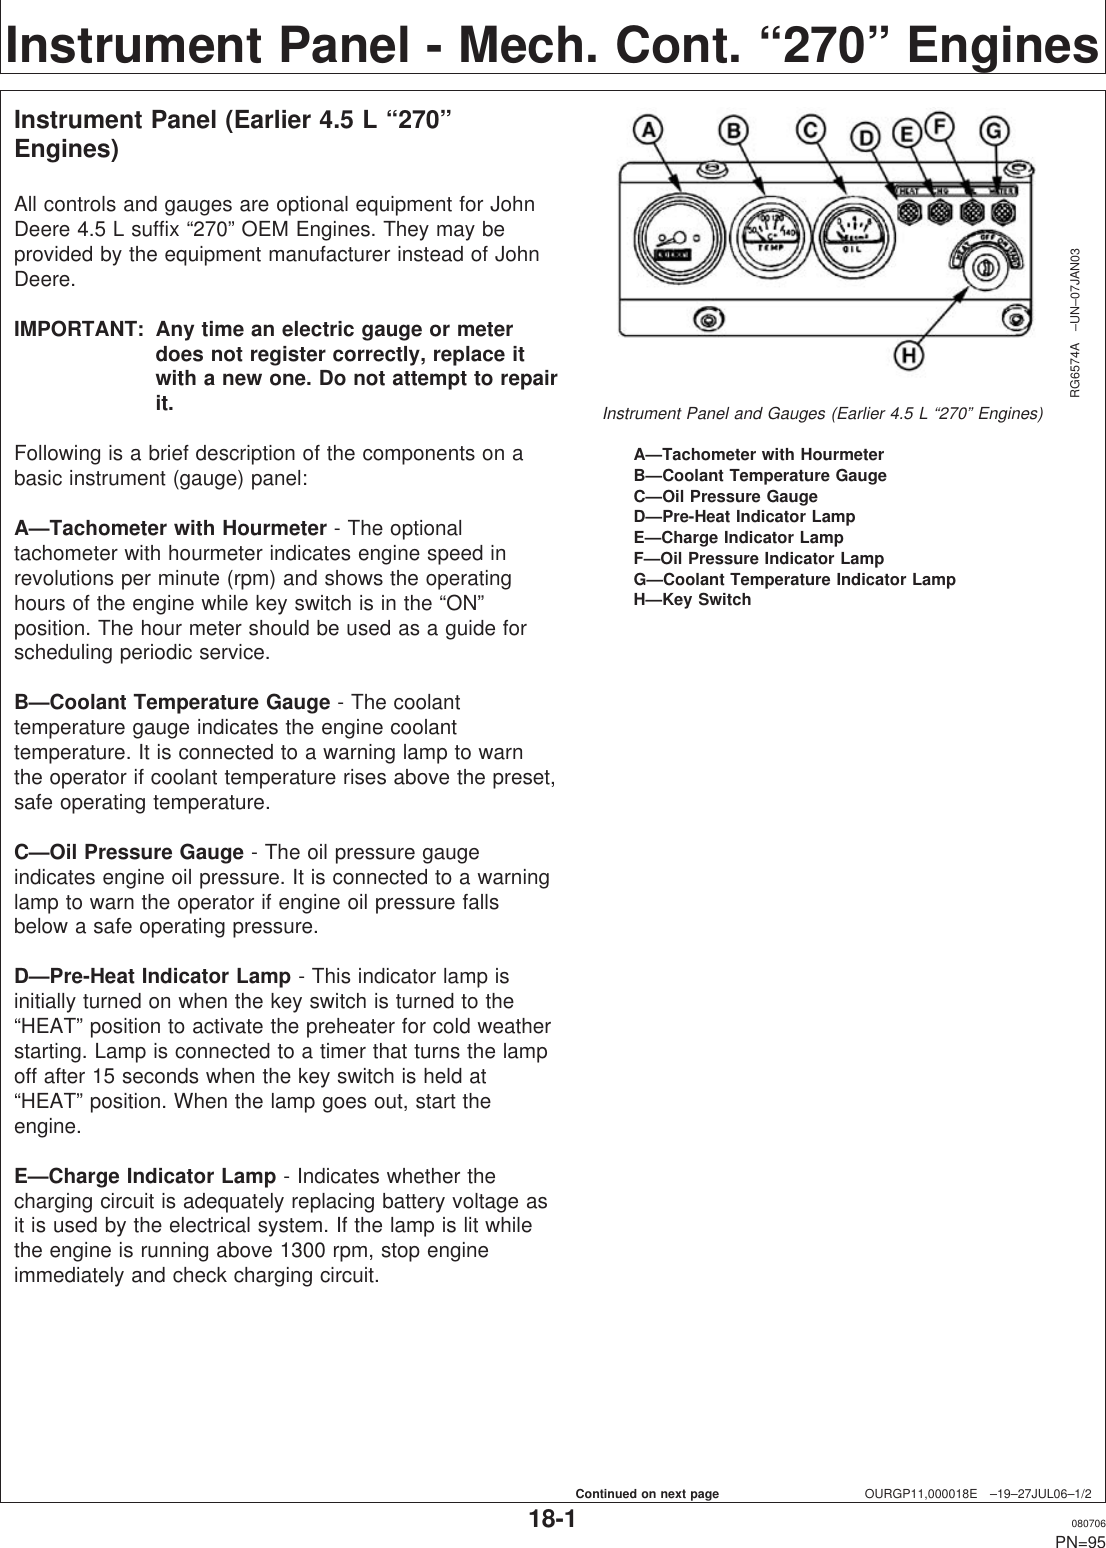 John Deere Powertech 6068 Users Manual 100525UNIT